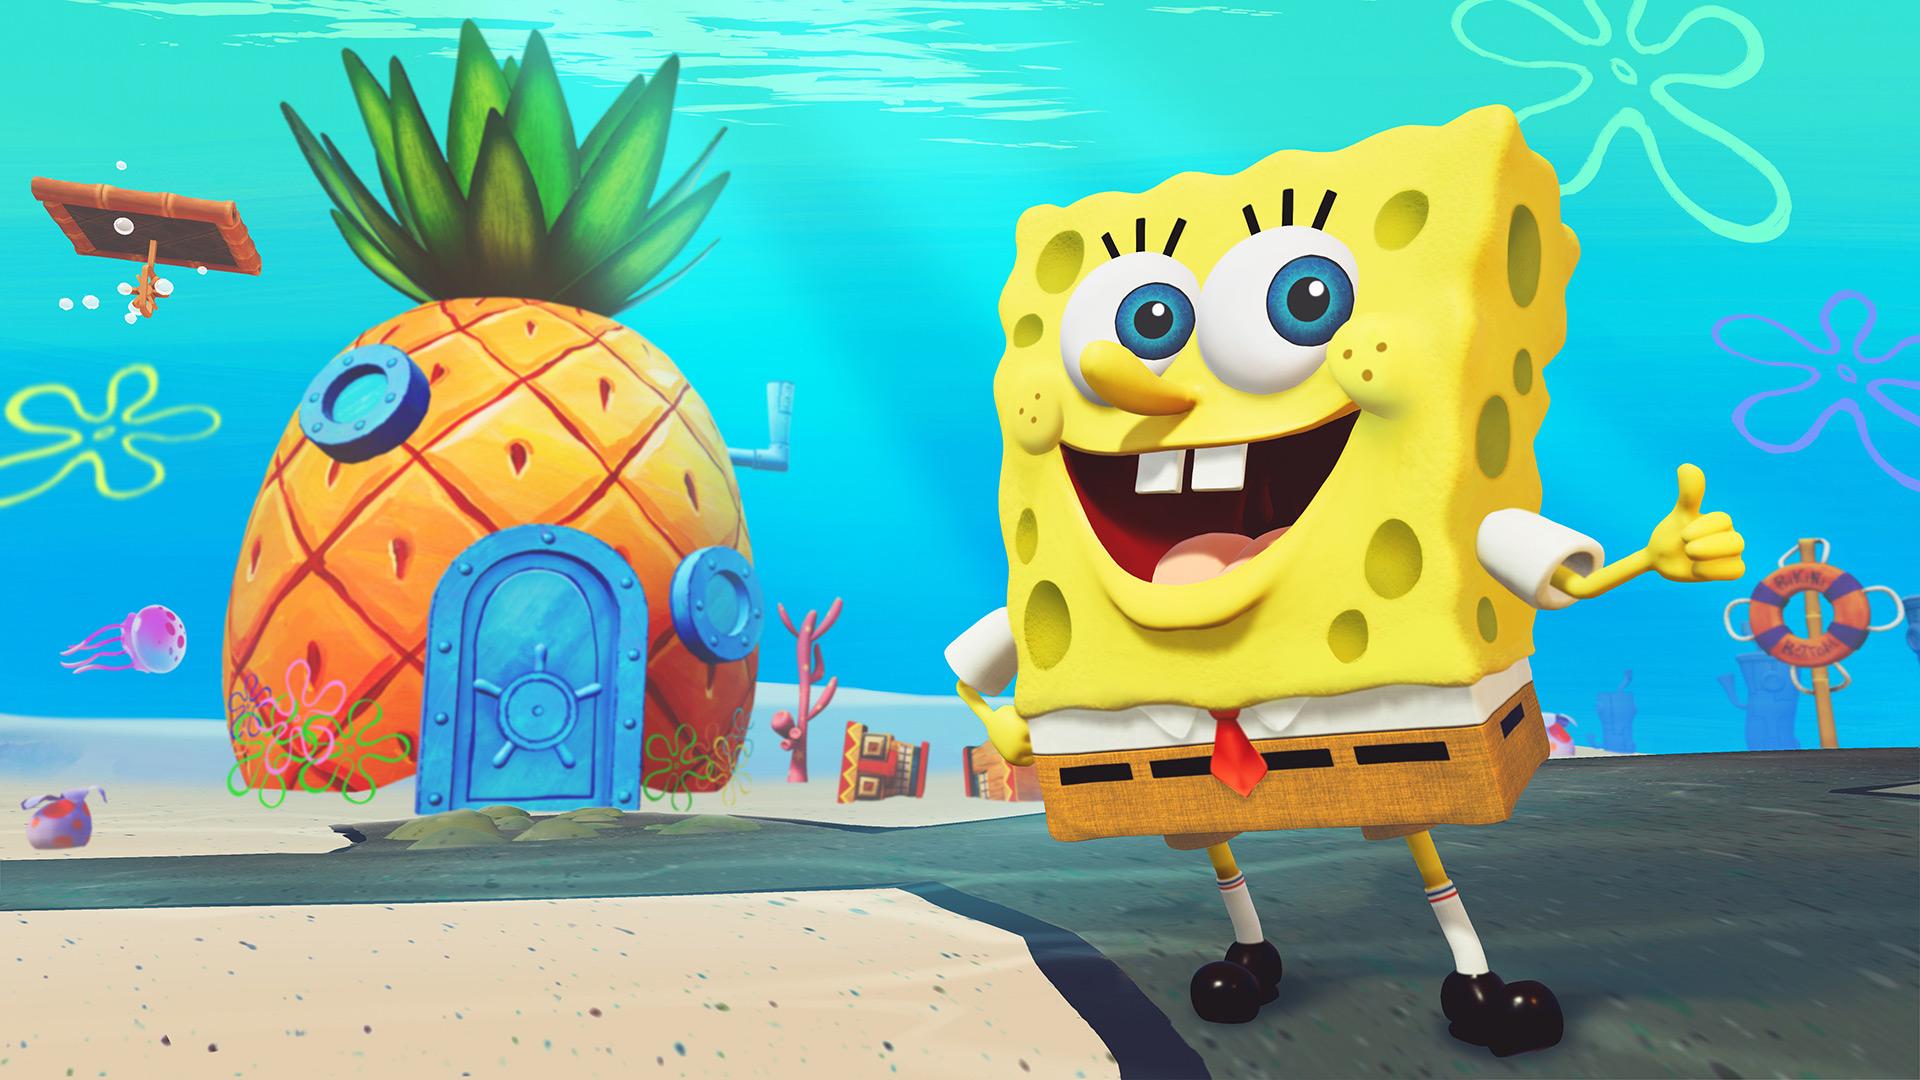 1ba7104c02 SpongeBob SquarePants: Battle of Bikini Bottom - gameware.at